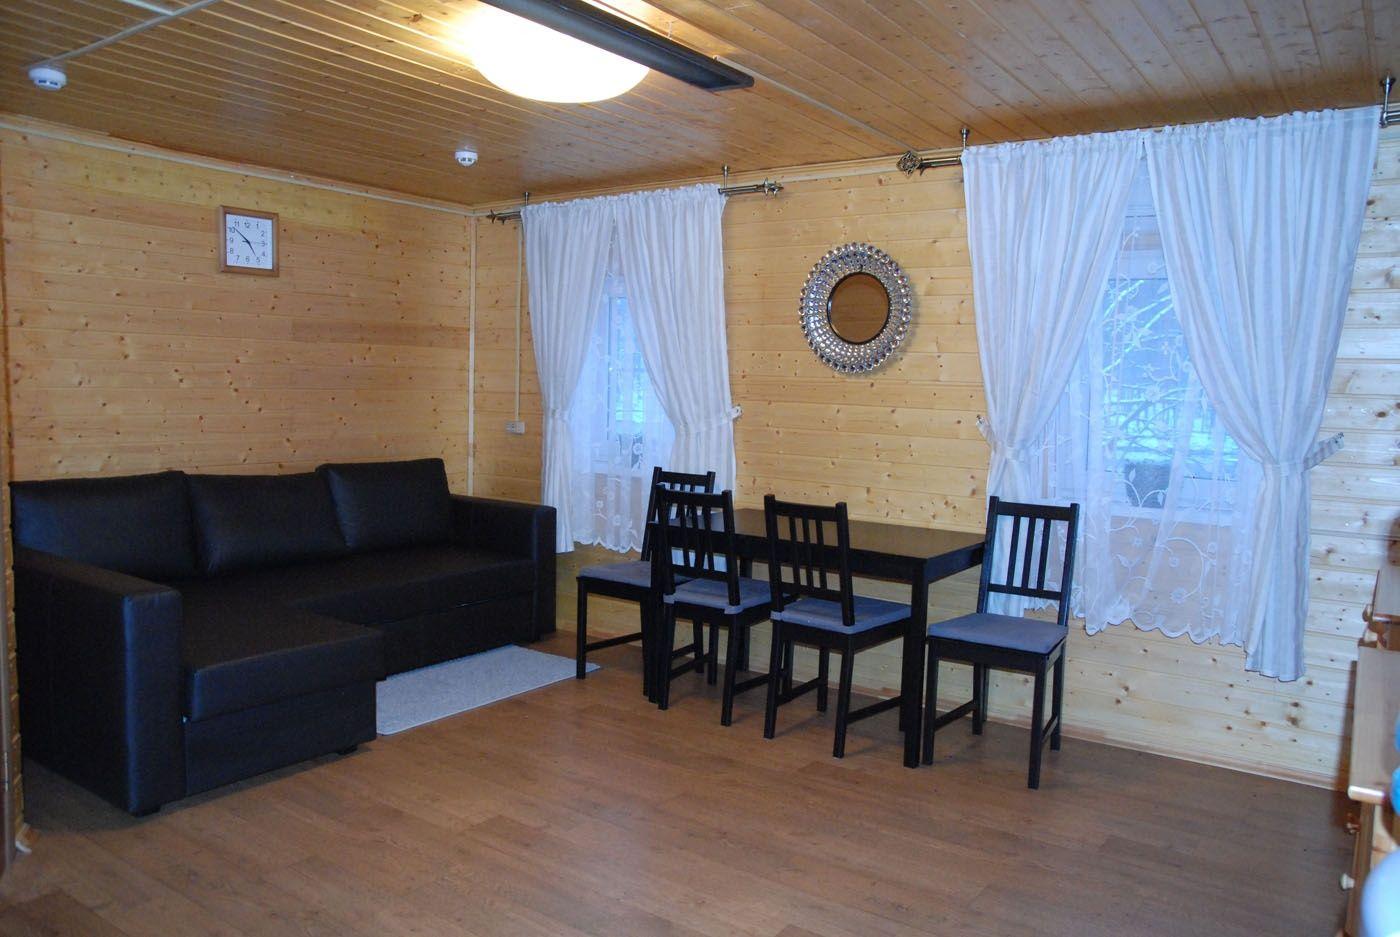 Резиденция Комфорта «Family Fishing» Краснодарский край Дом №2,3 у озера , фото 3